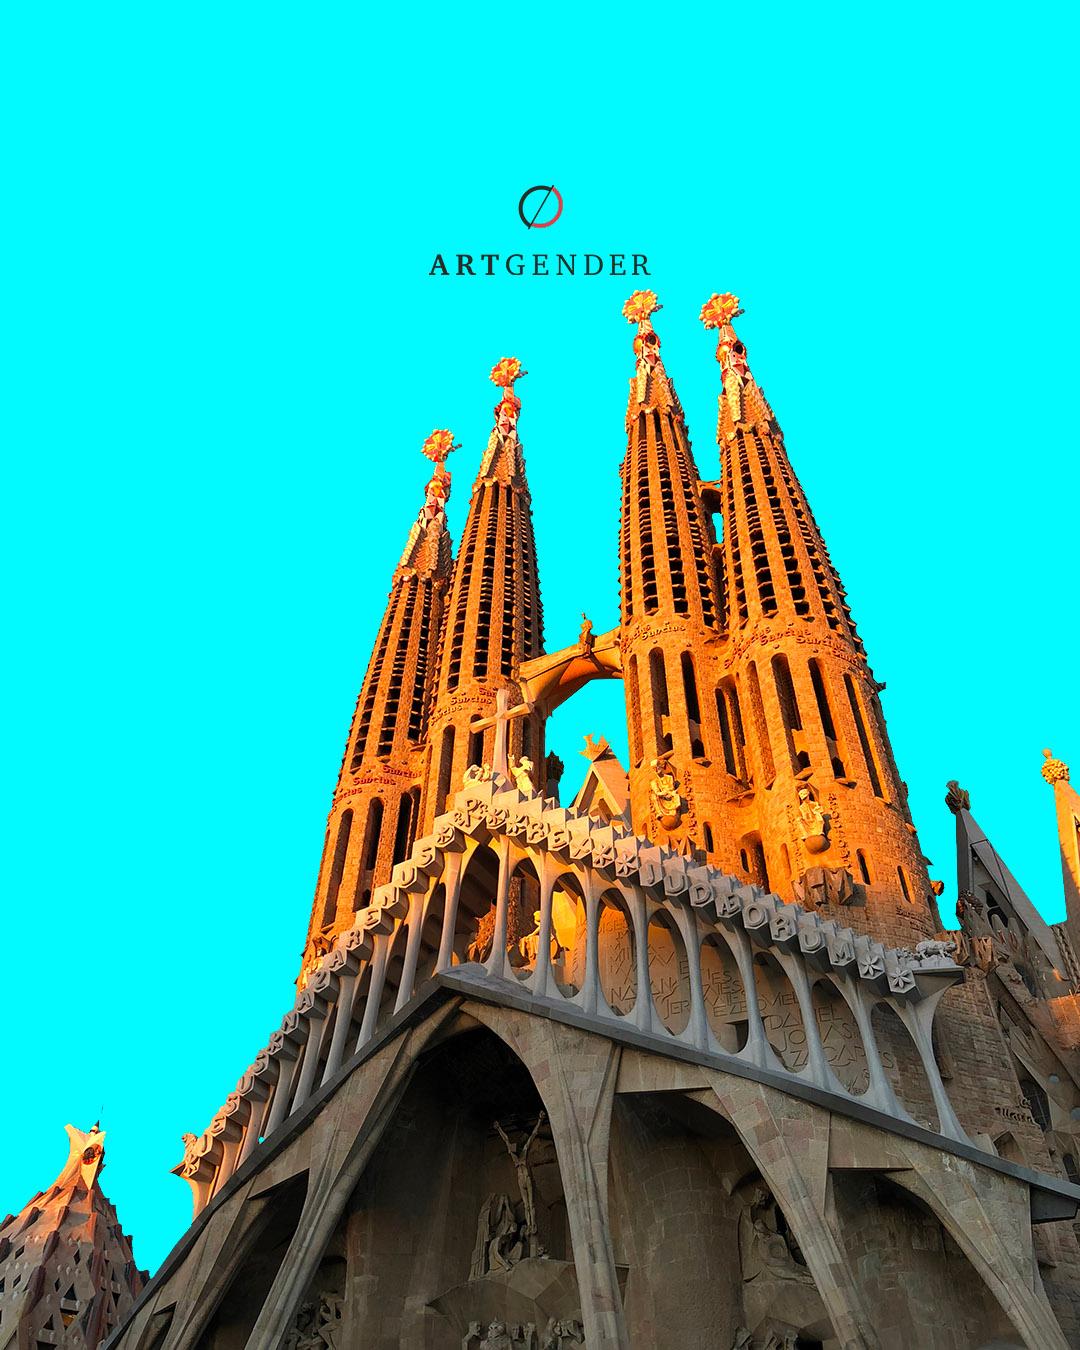 Sagrada Familia Antoni Gaudì